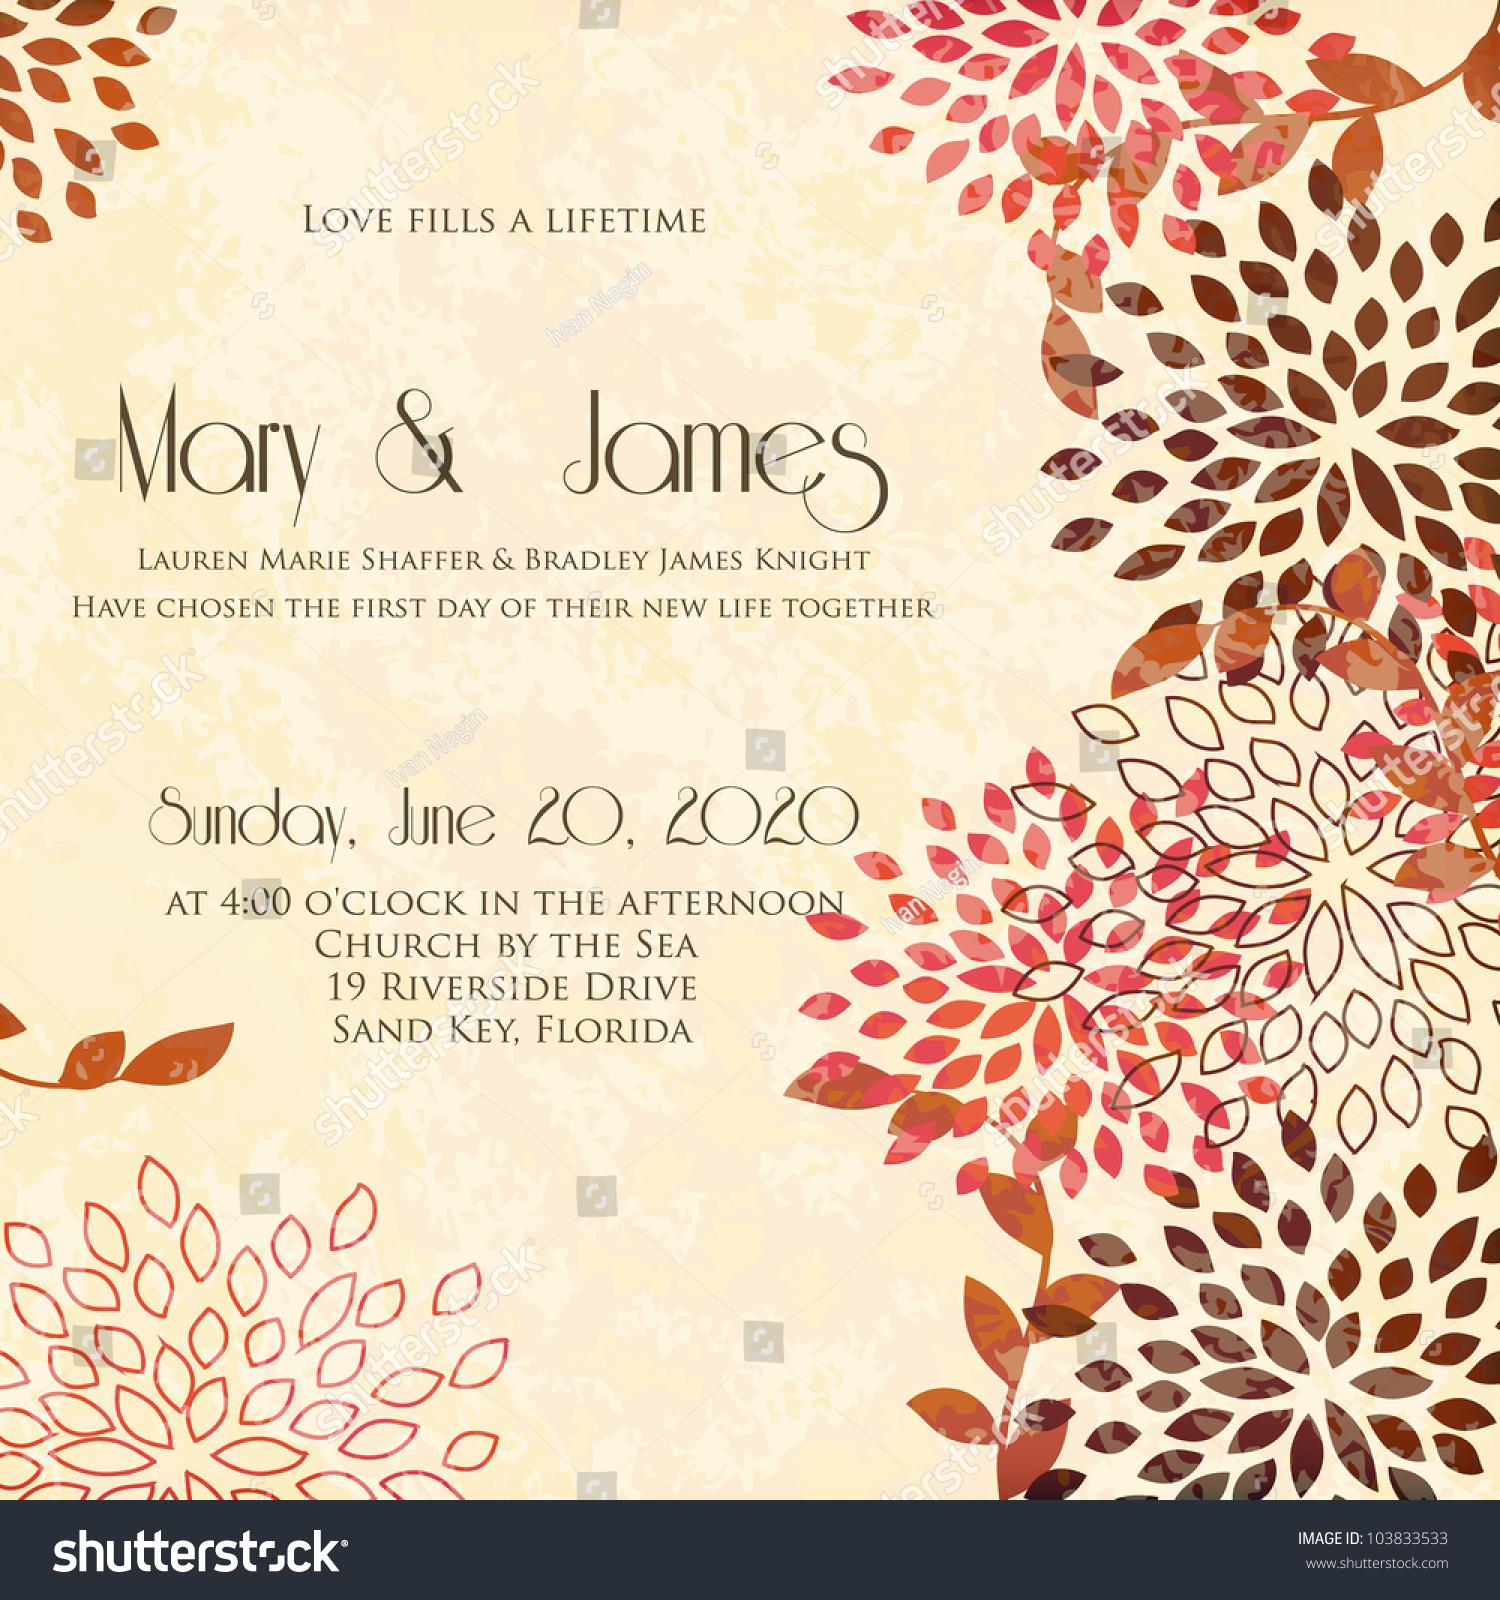 Valentine Invitation Templates was great invitations example